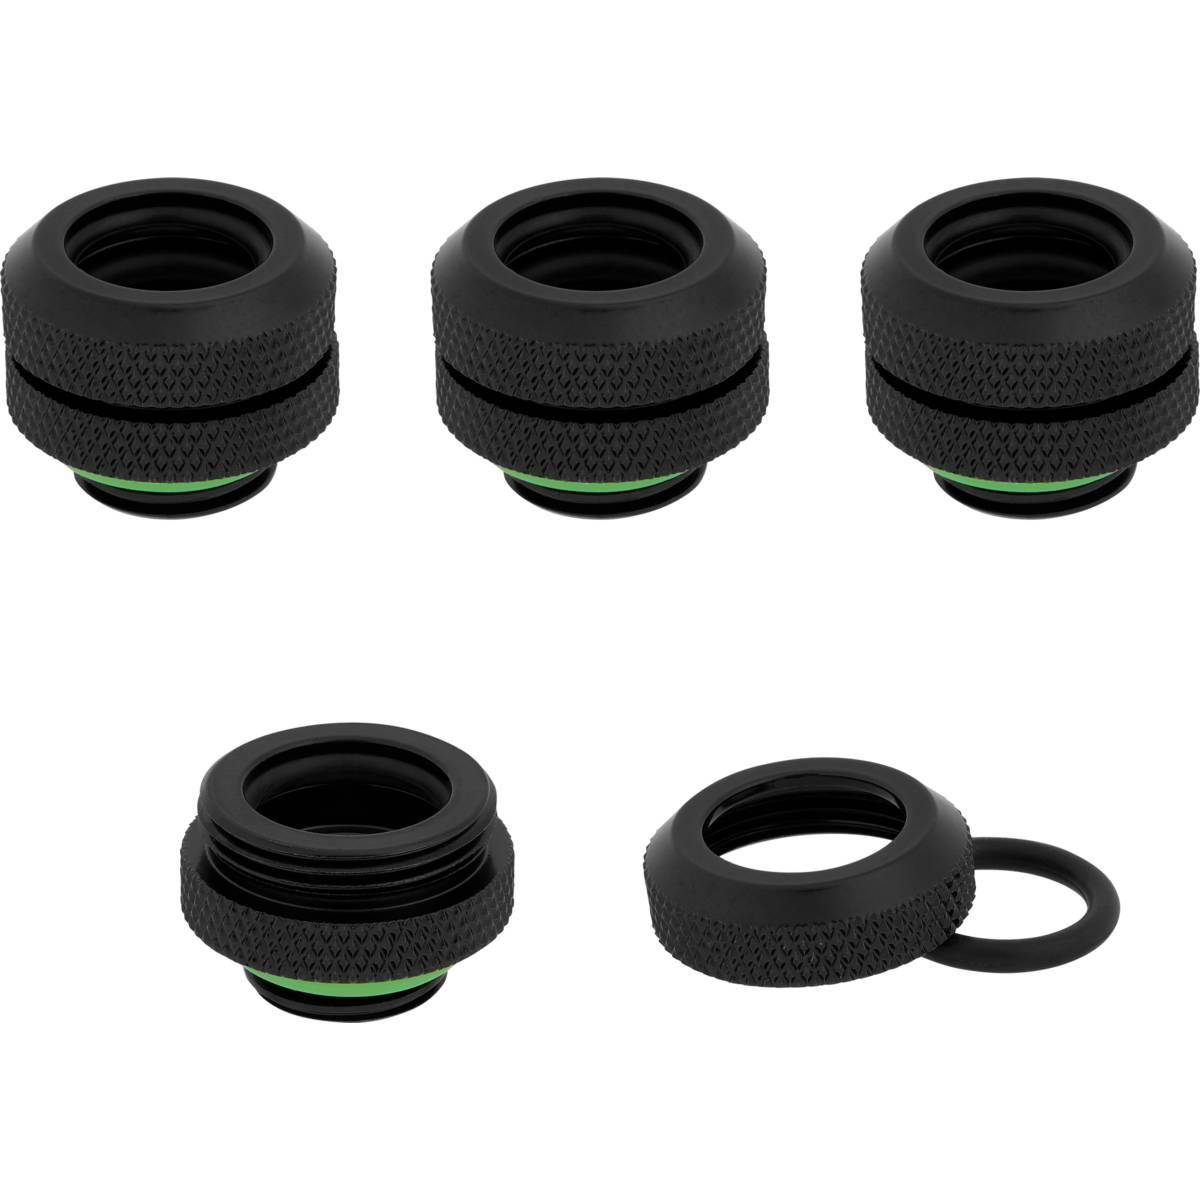 CORSAIR Hydro X Series XF Hardline 12mm OD Fitting Four Pack - Black